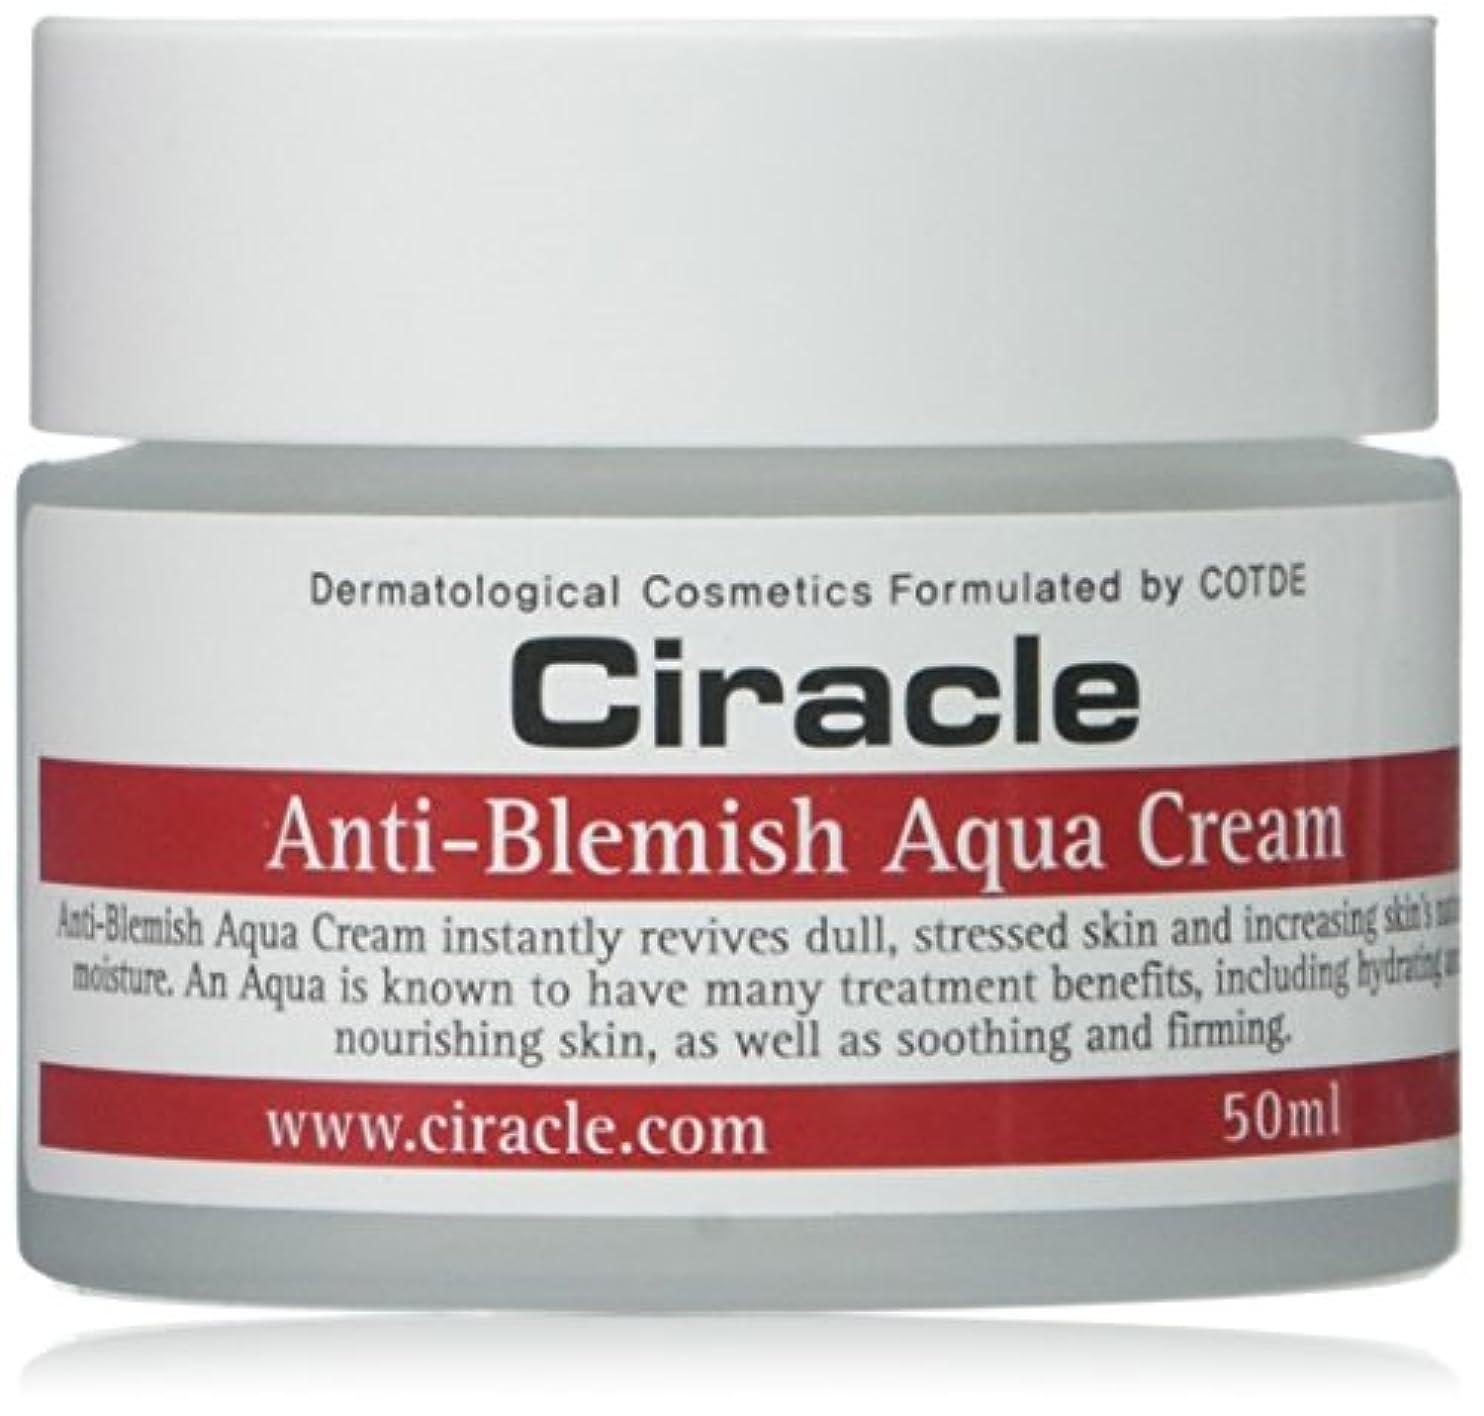 Ciracle シラクル アンチ ブレミッシュ アクア クリーム オイリー肌 ニキビ肌 水分クリーム ?バランス 天然アロエ